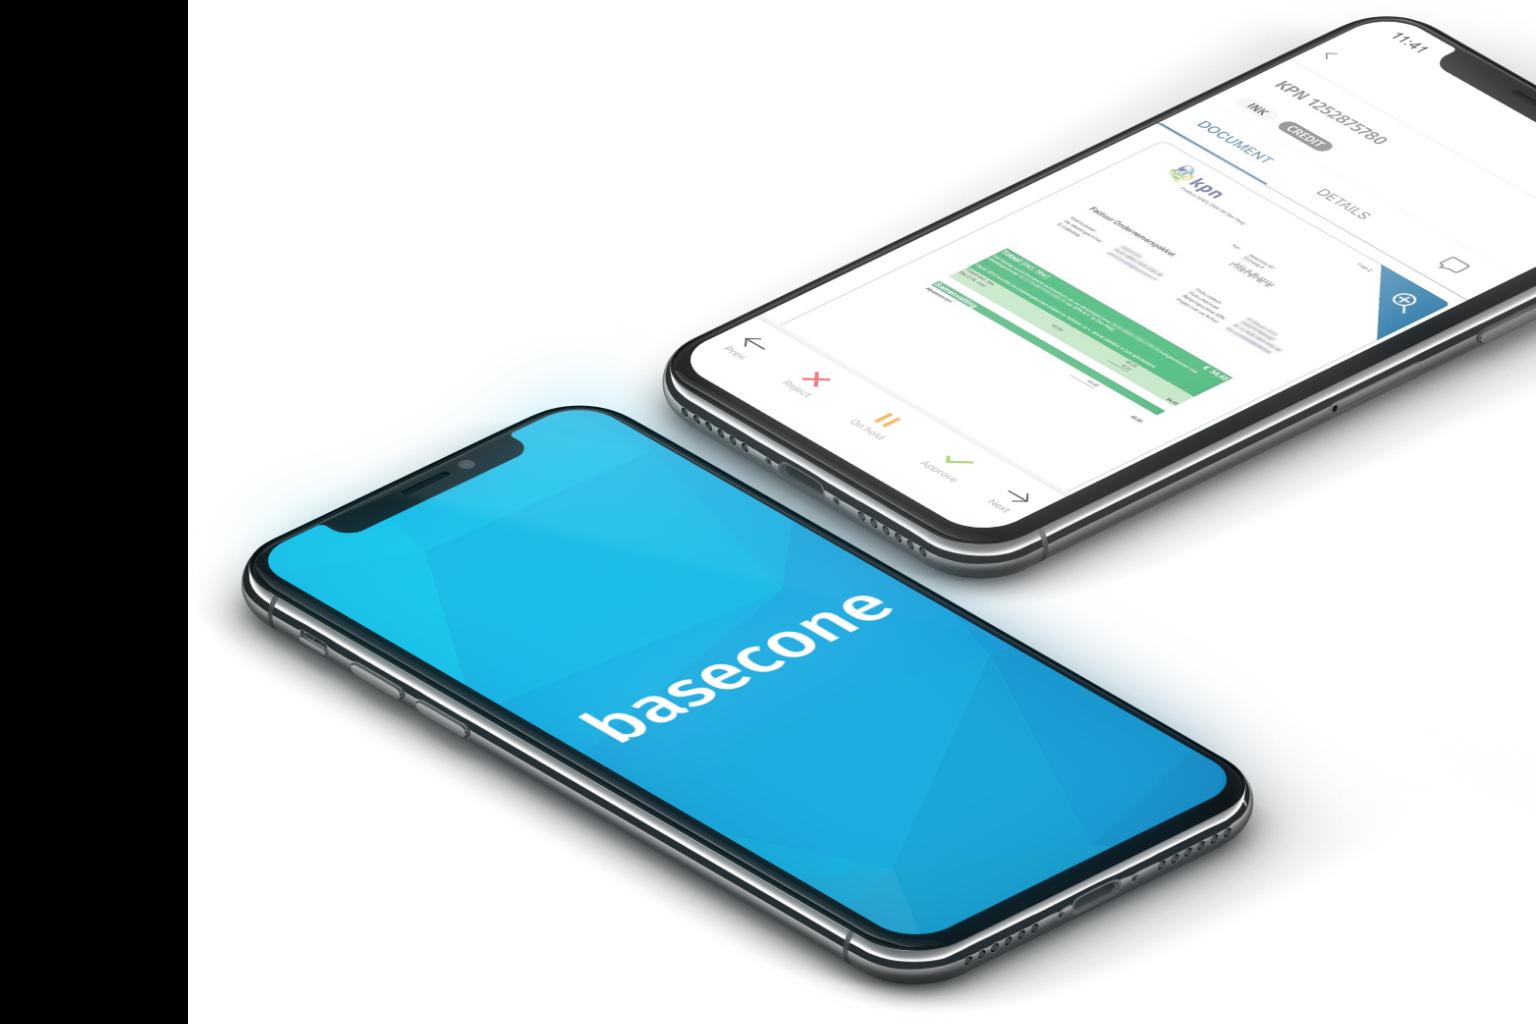 De bonnetjes app van Basecone